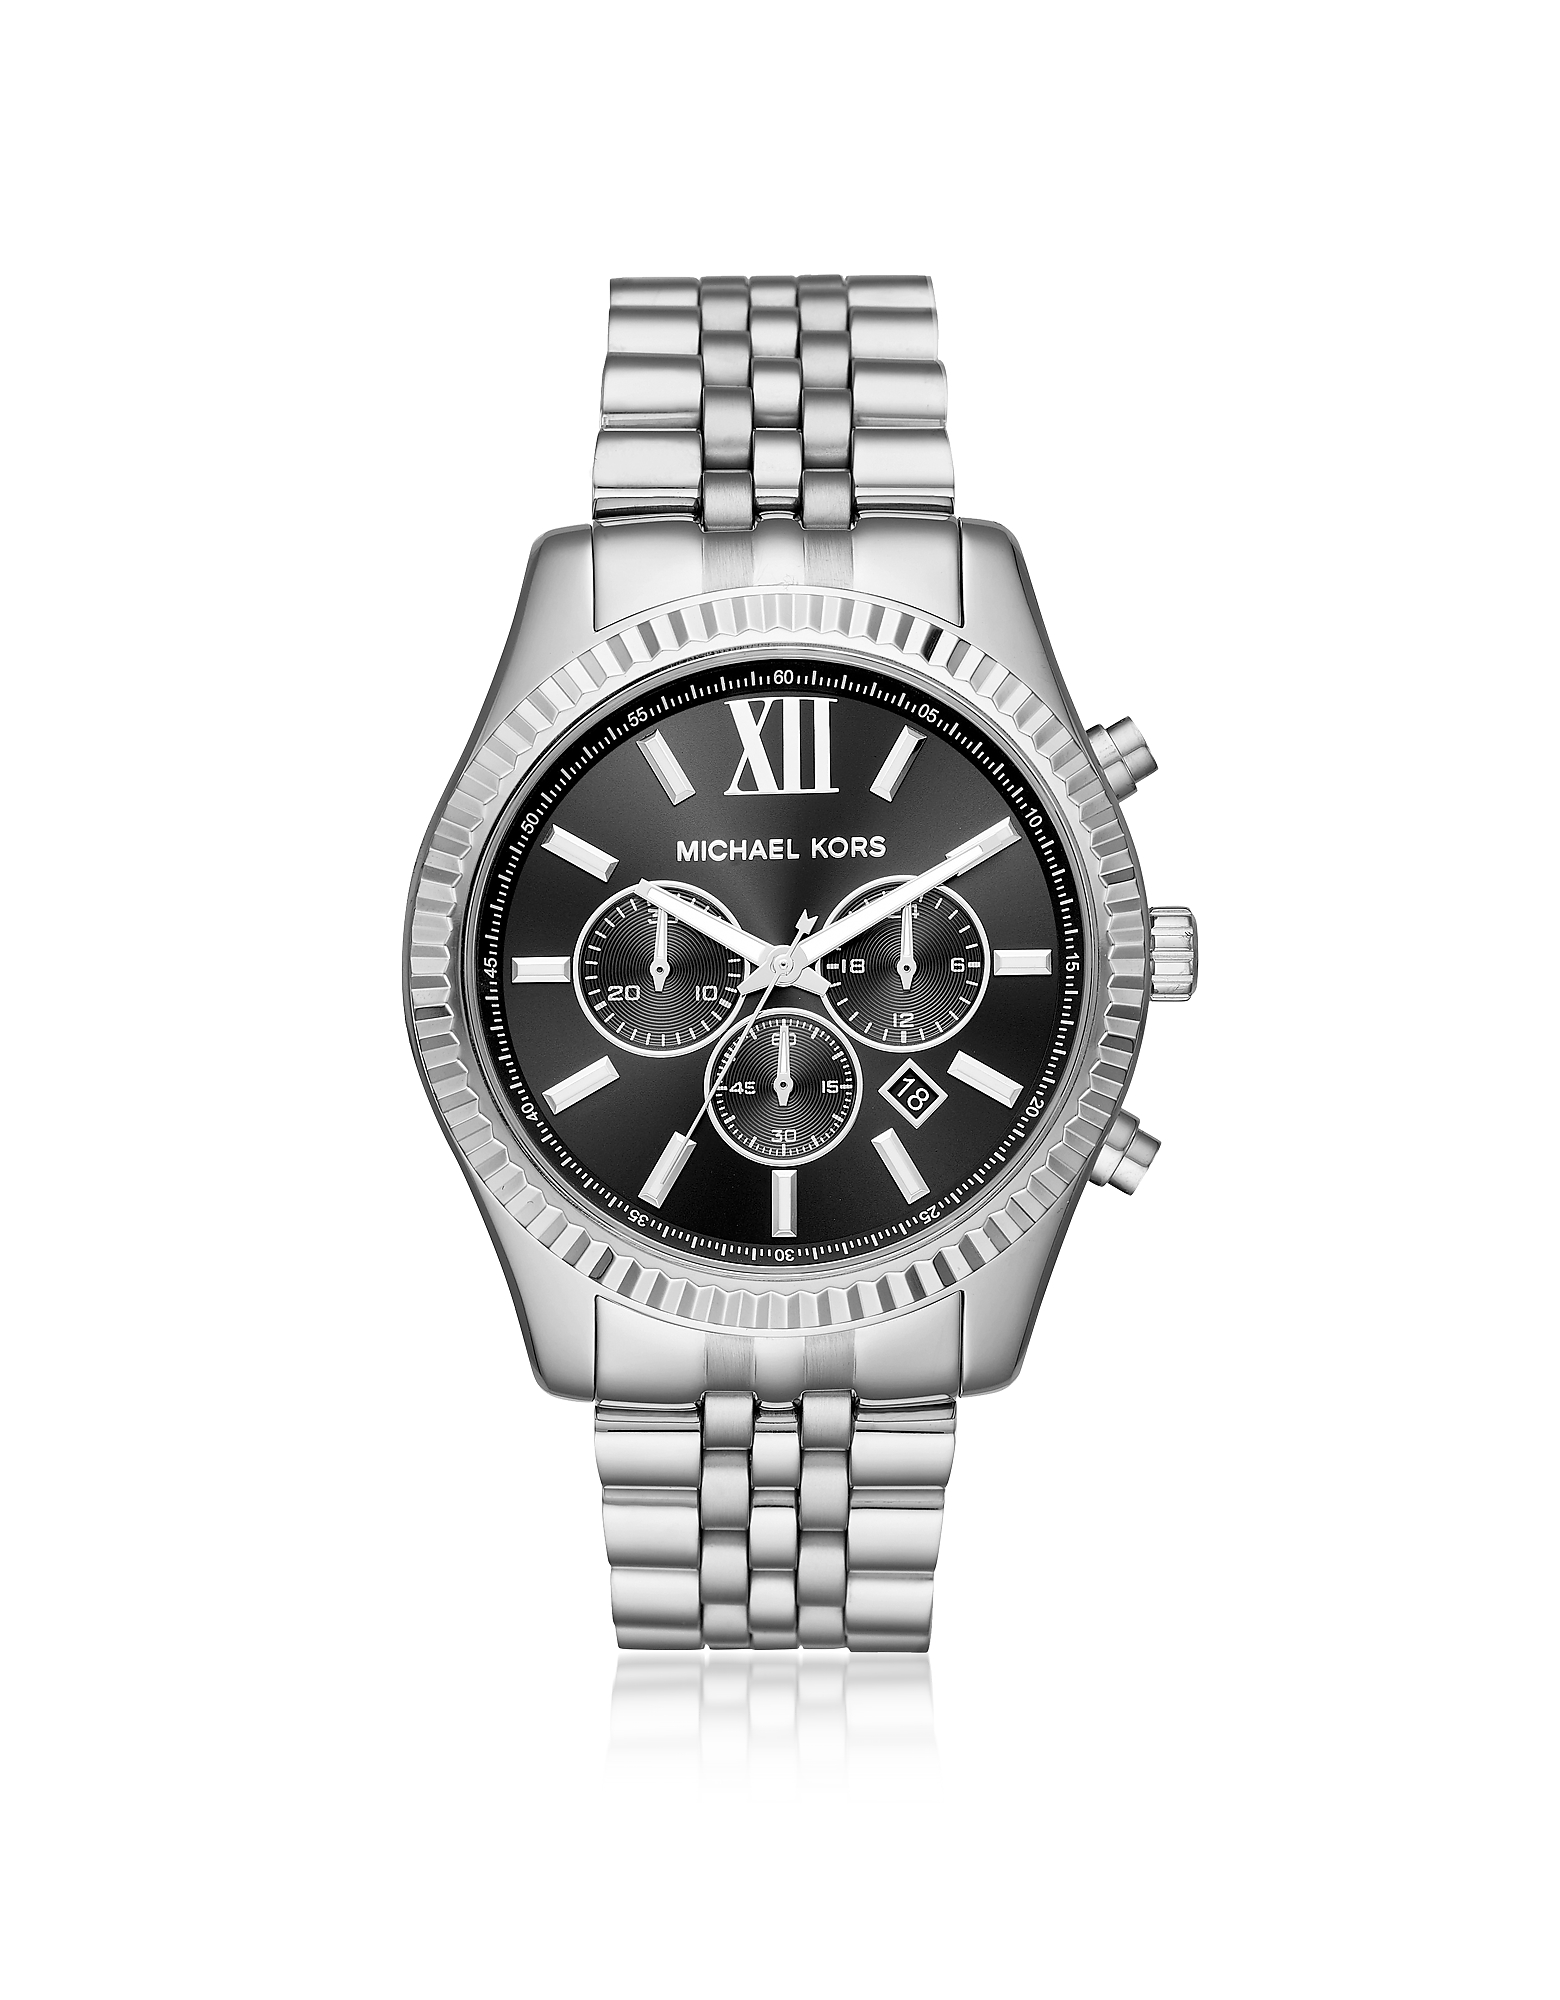 Michael Kors Men's Lexington Stainless-Steel Watch